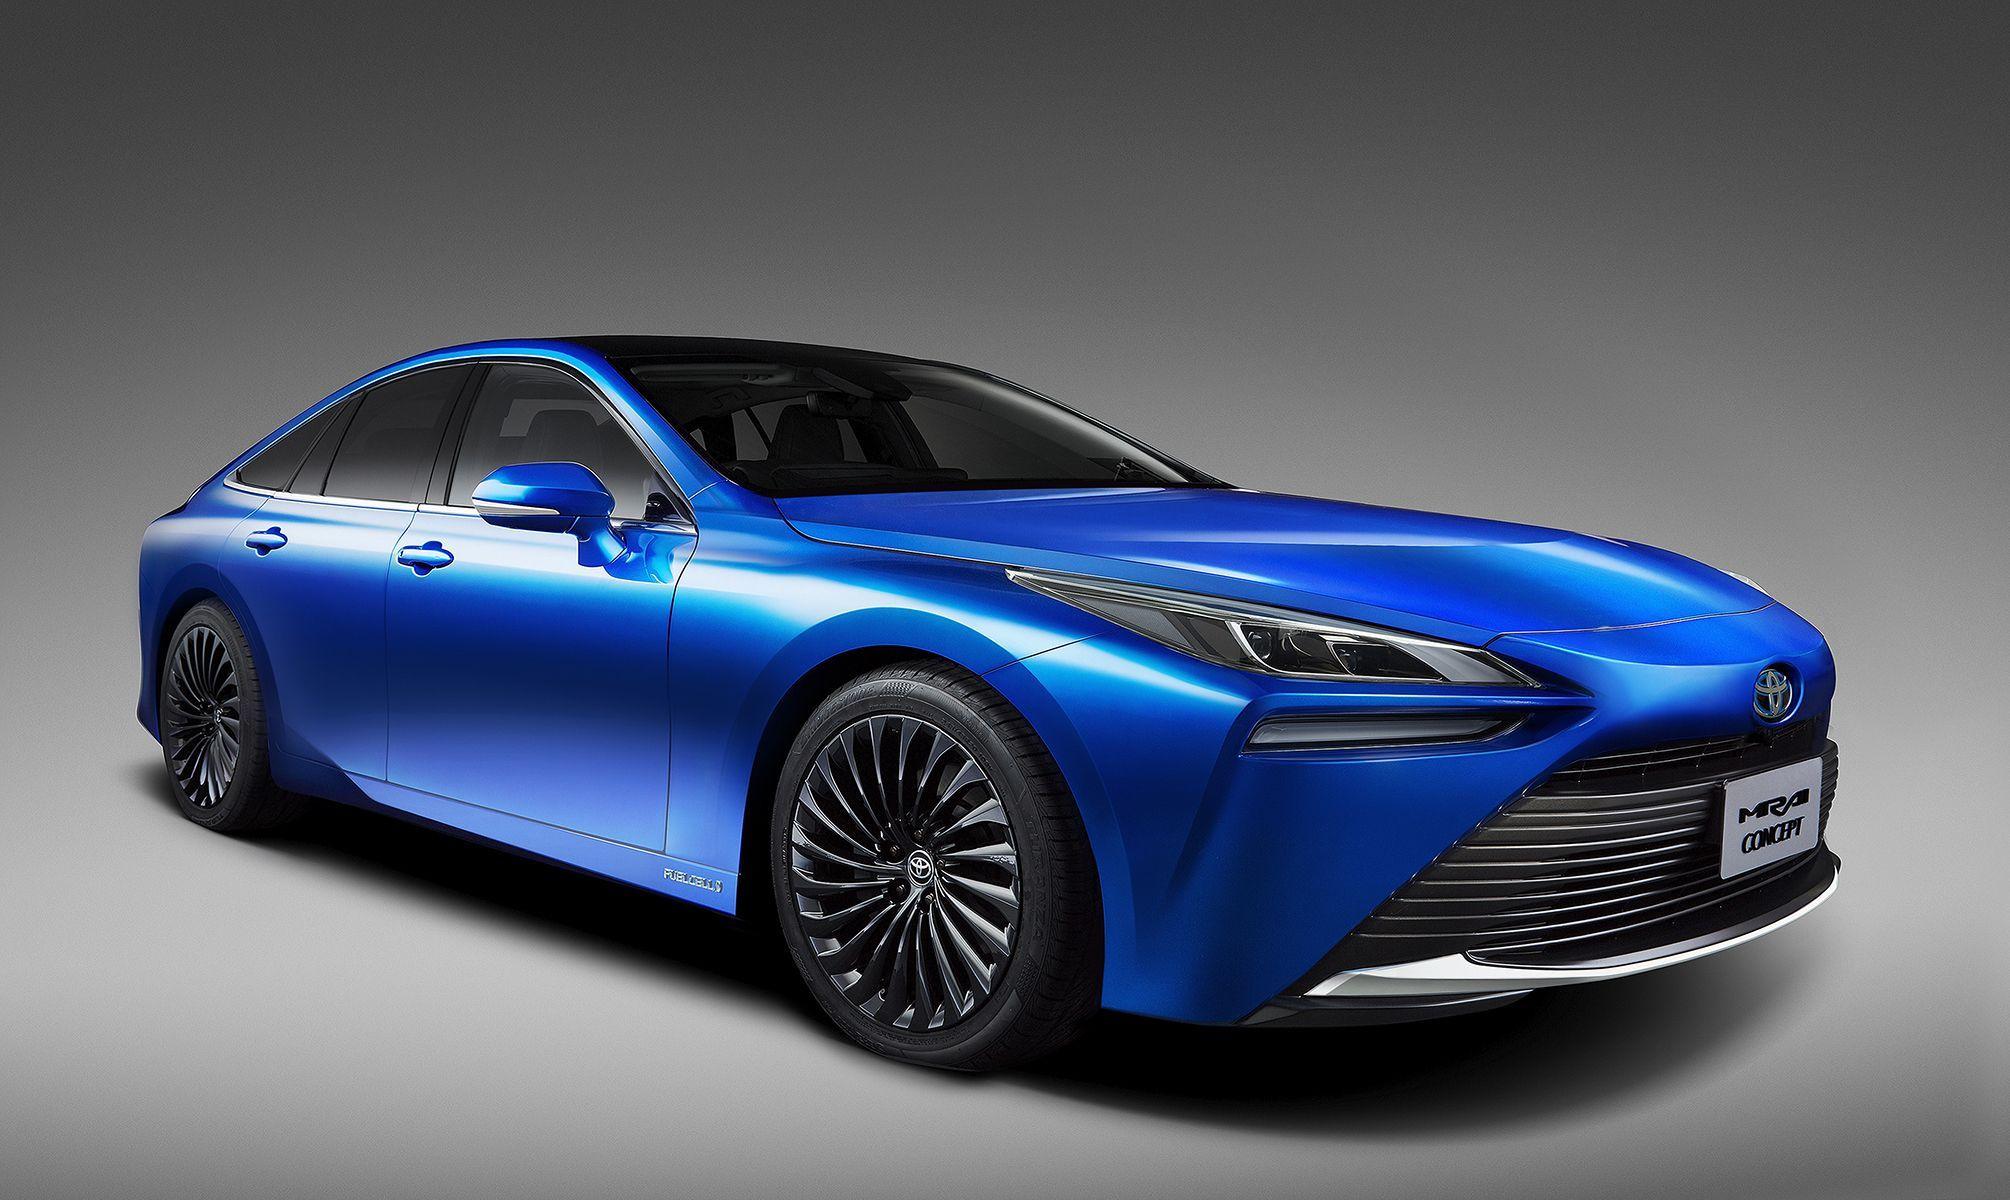 2021 Toyota Mirai Fuel Cell Sedan Goes Rwd For Second Generation Hydrogen Powered Cars Hydrogen Car Tokyo Motor Show